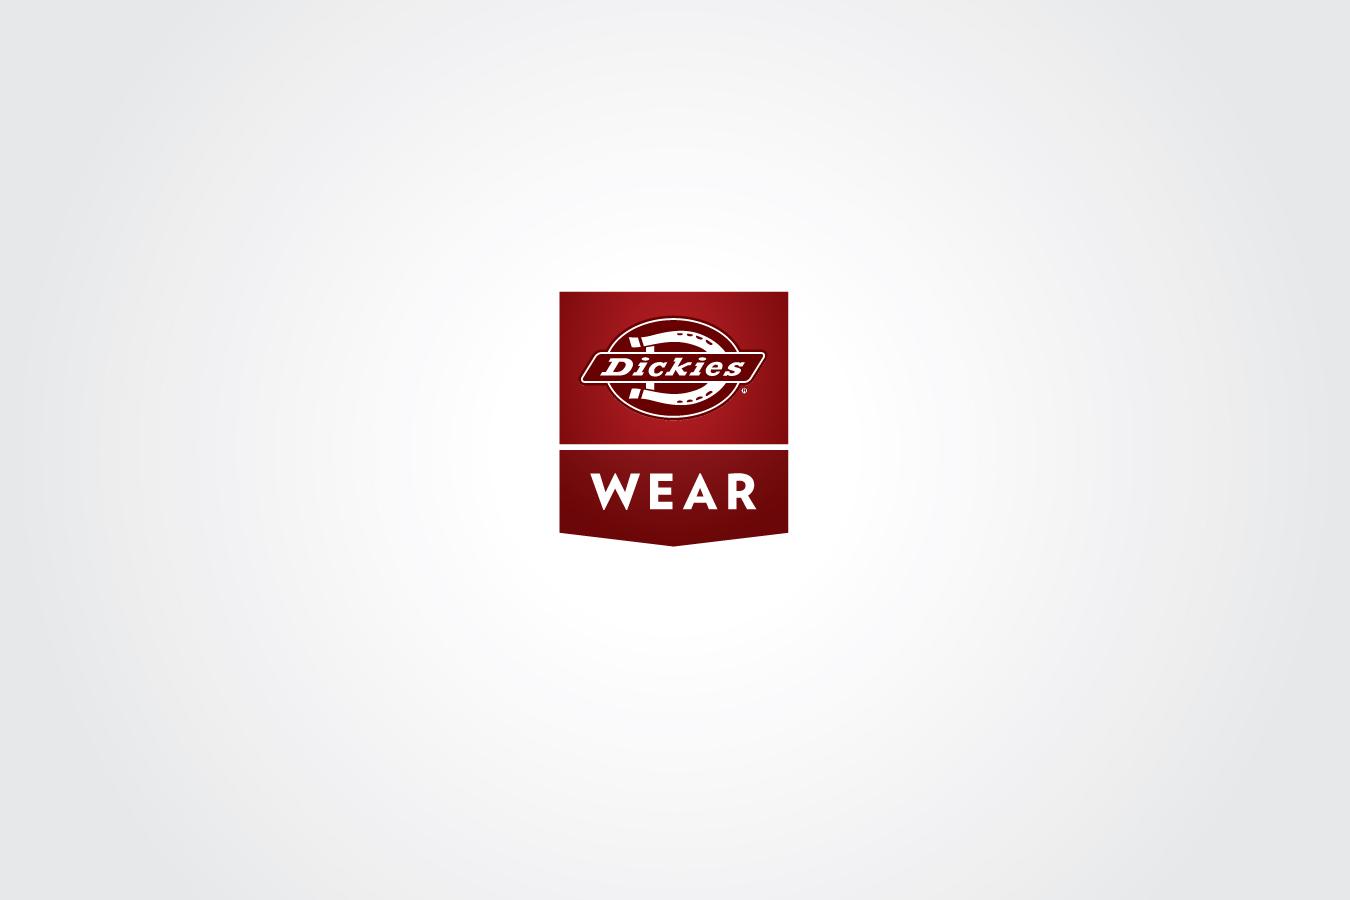 Logo_DickiesWear